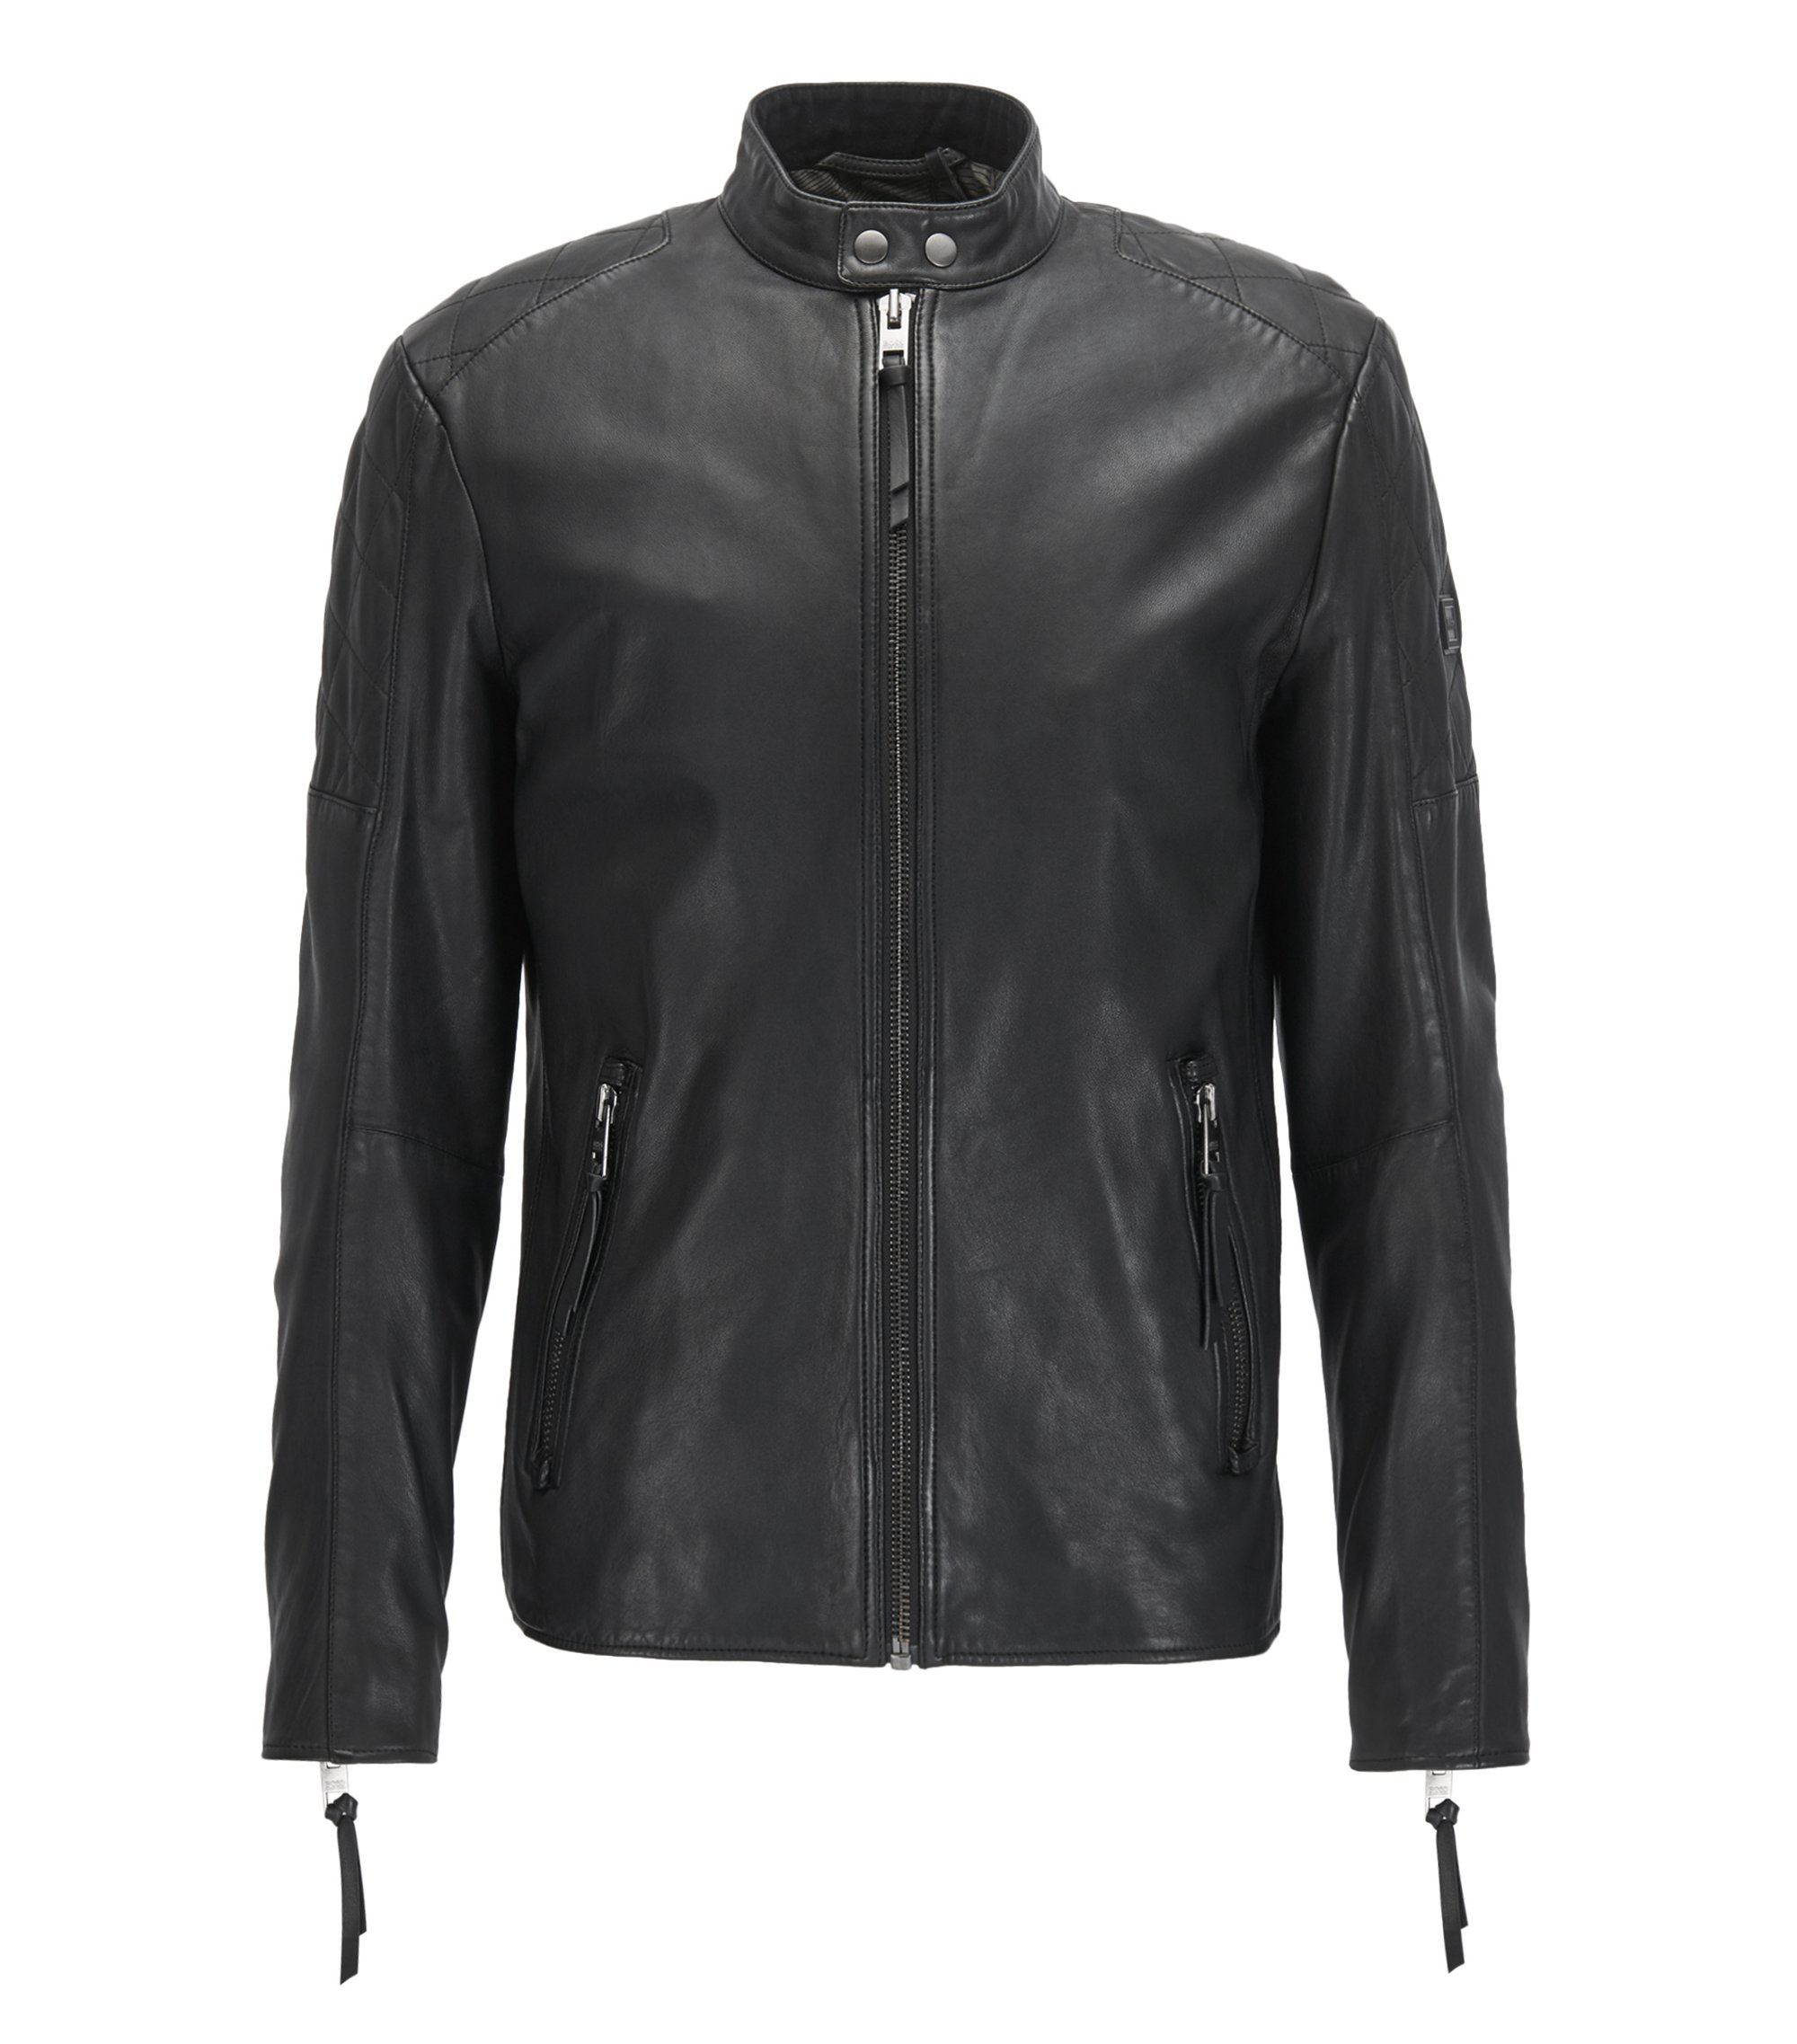 Sheepskin Leather Jacket | Jeepo, Black